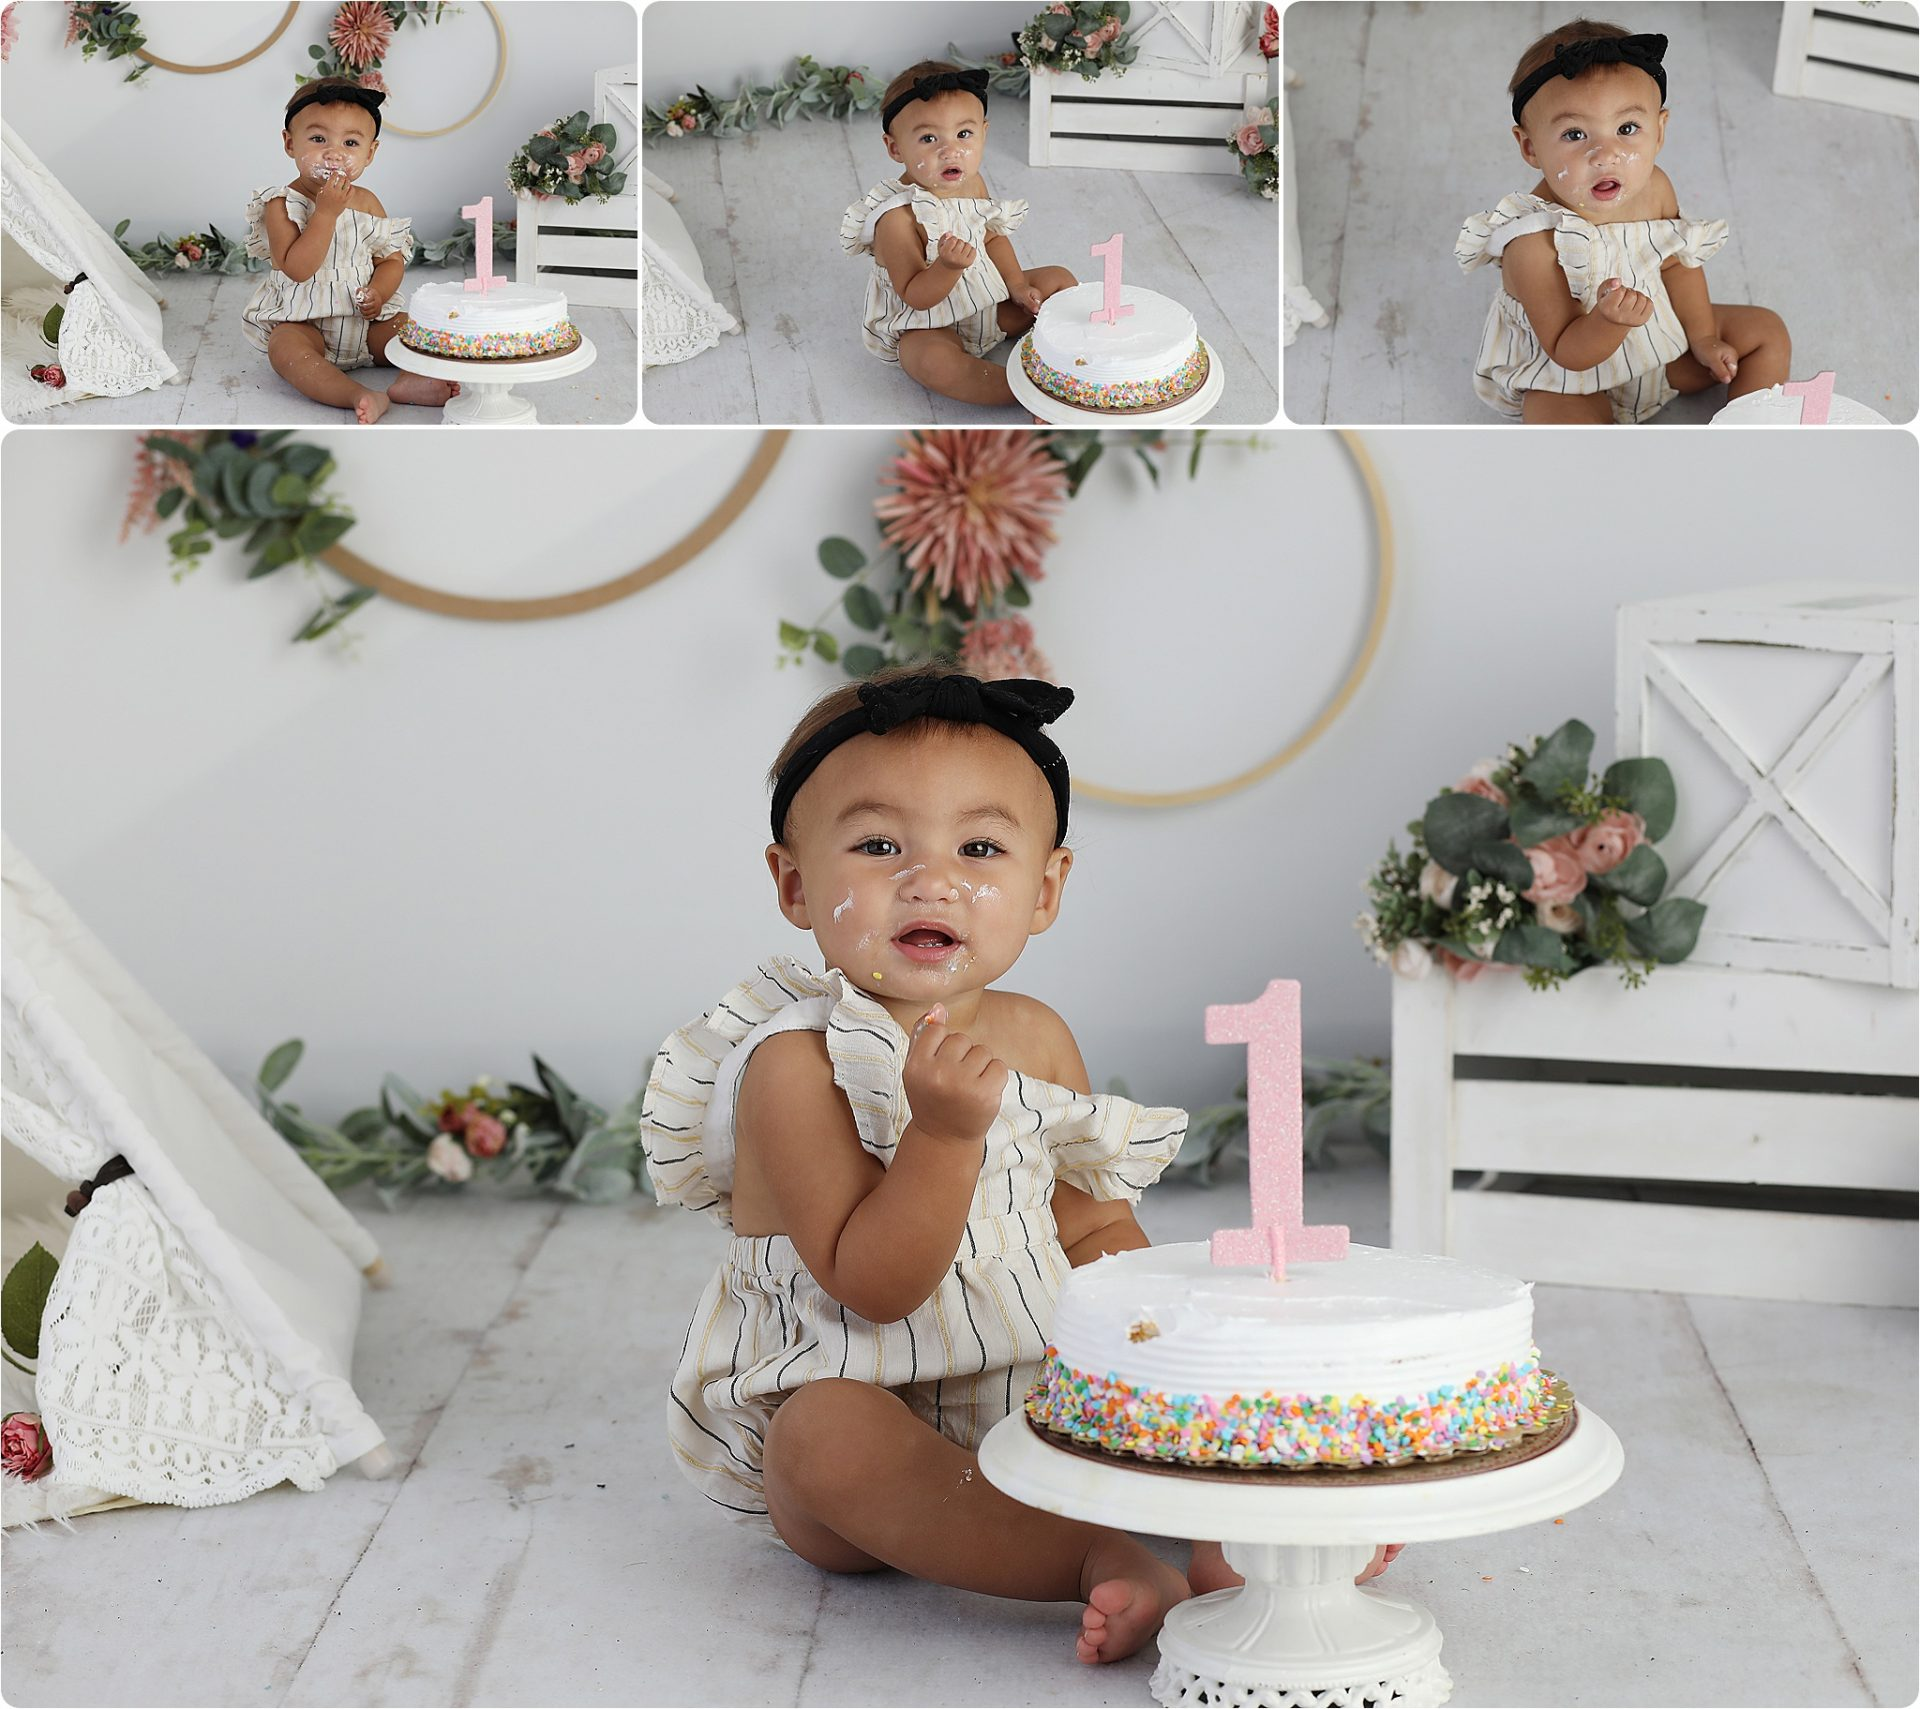 Tucson baby Birthday photos